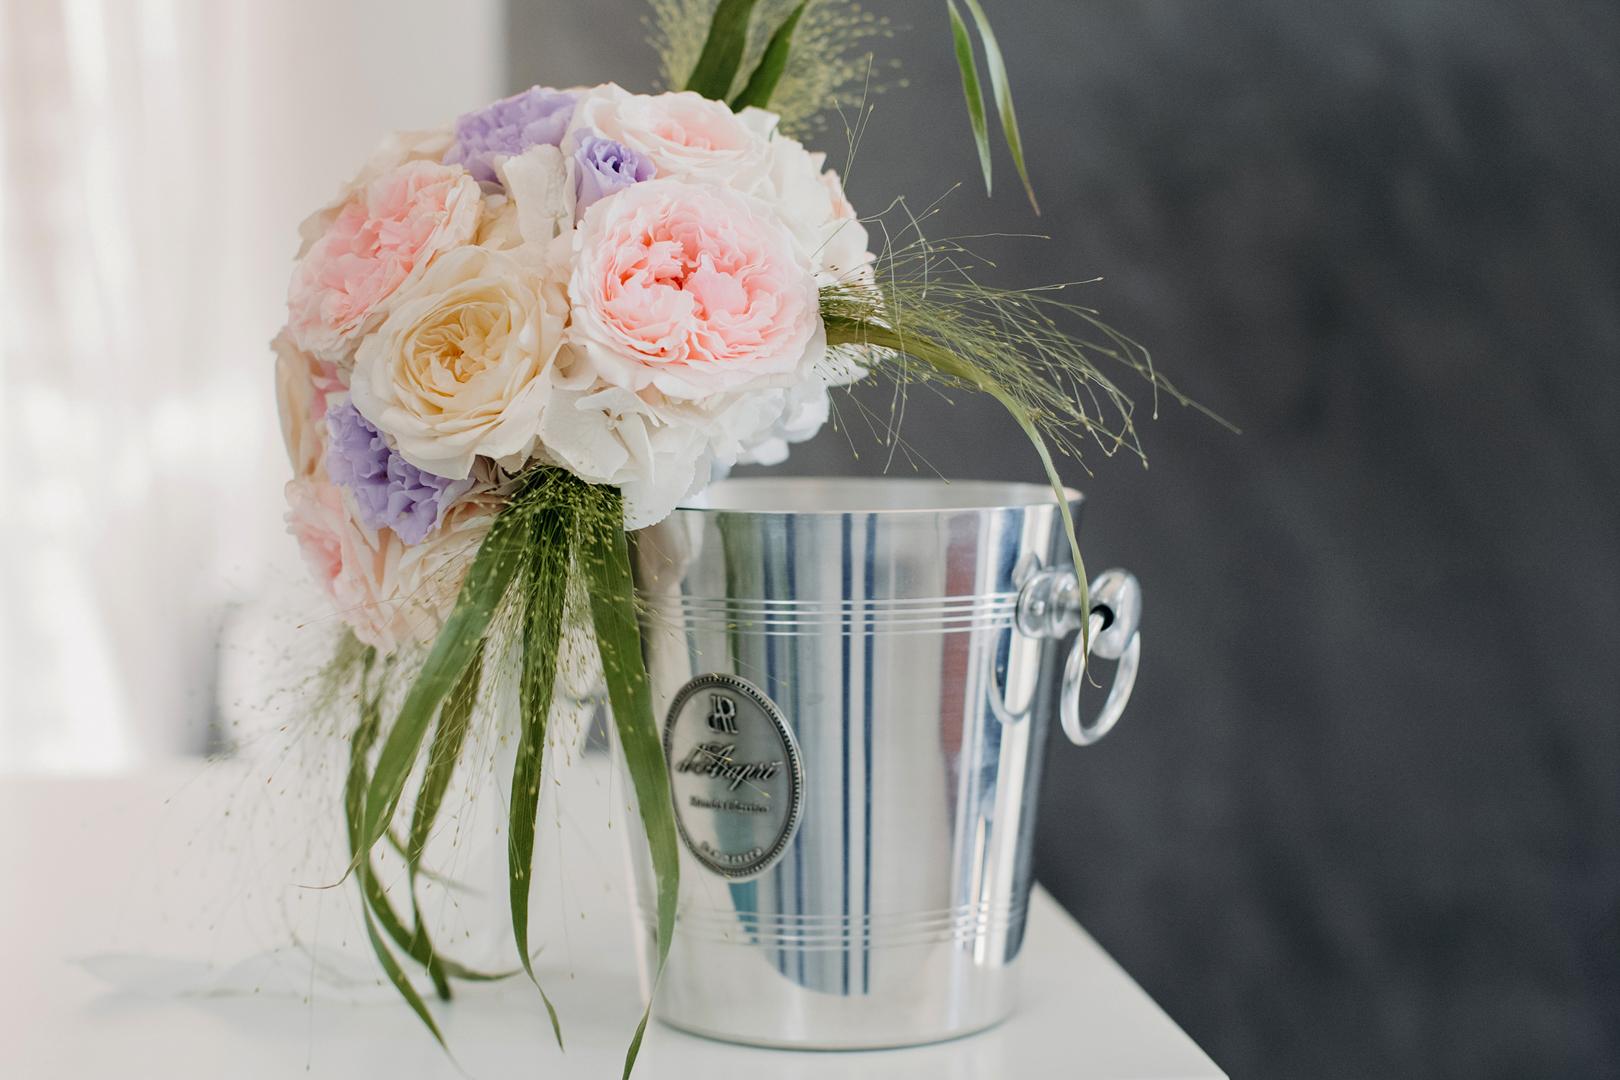 2 gianni-lepore-fotografo-bouquet-sposa